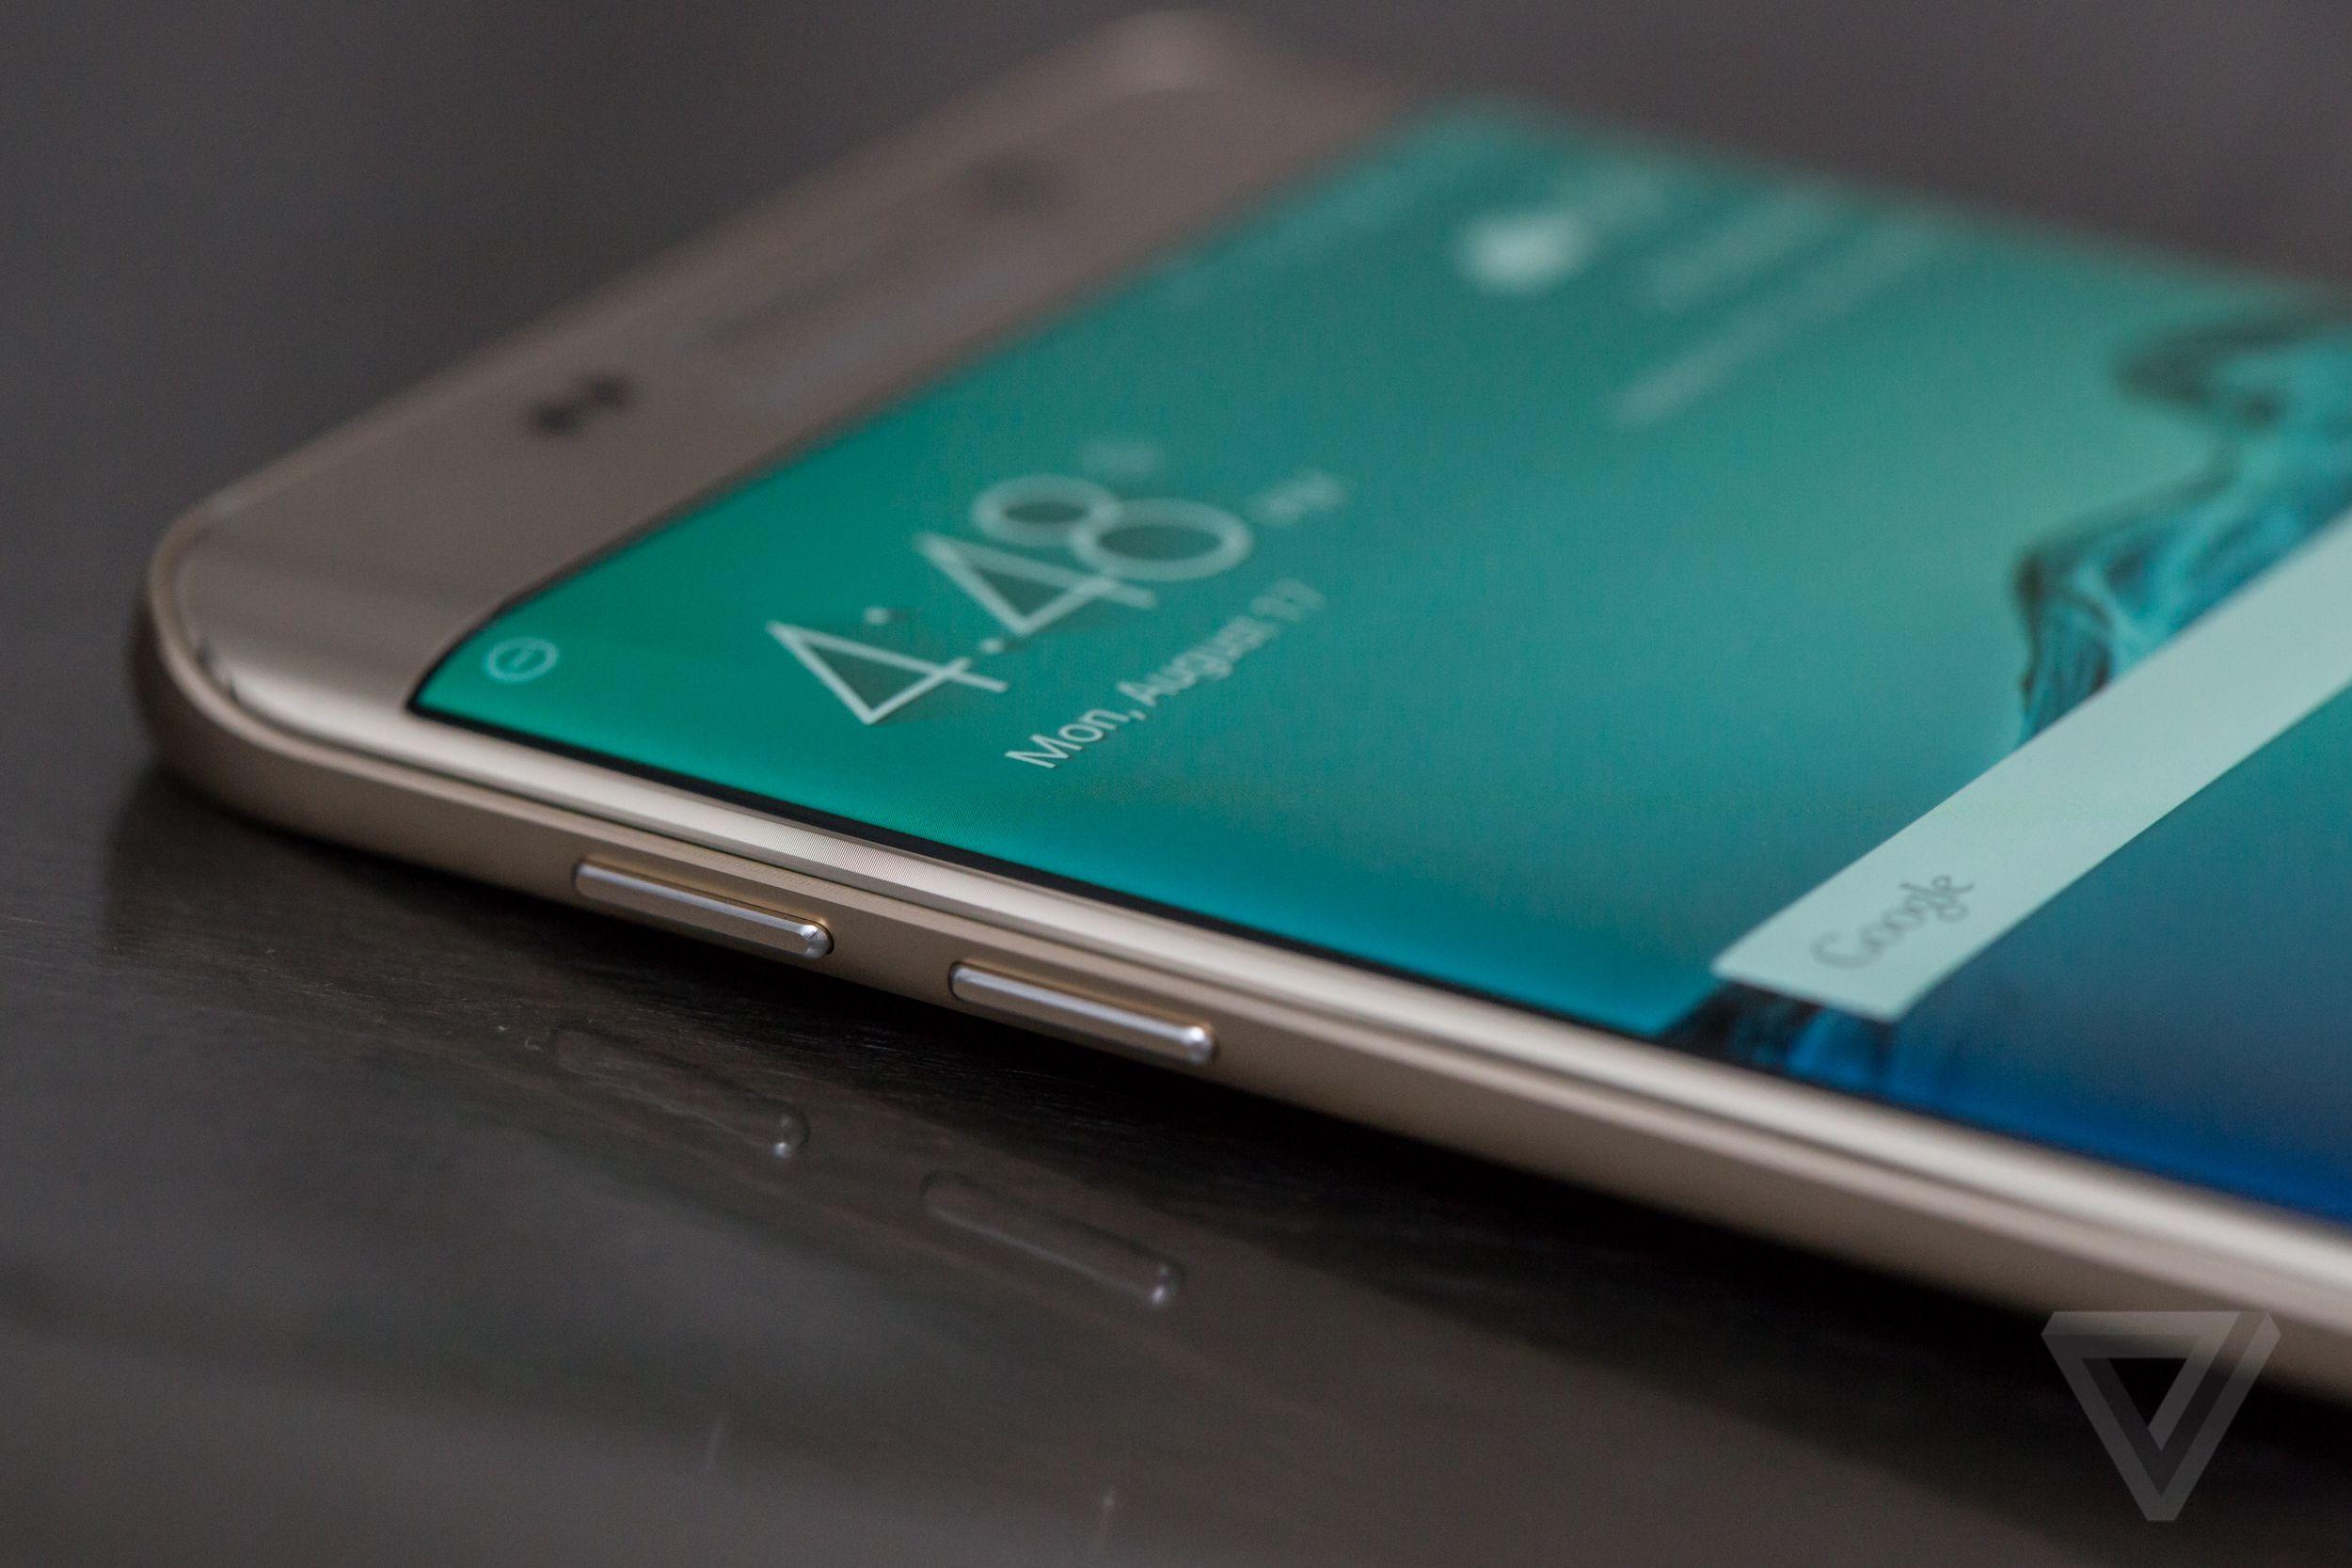 smartfon apple iphone 5